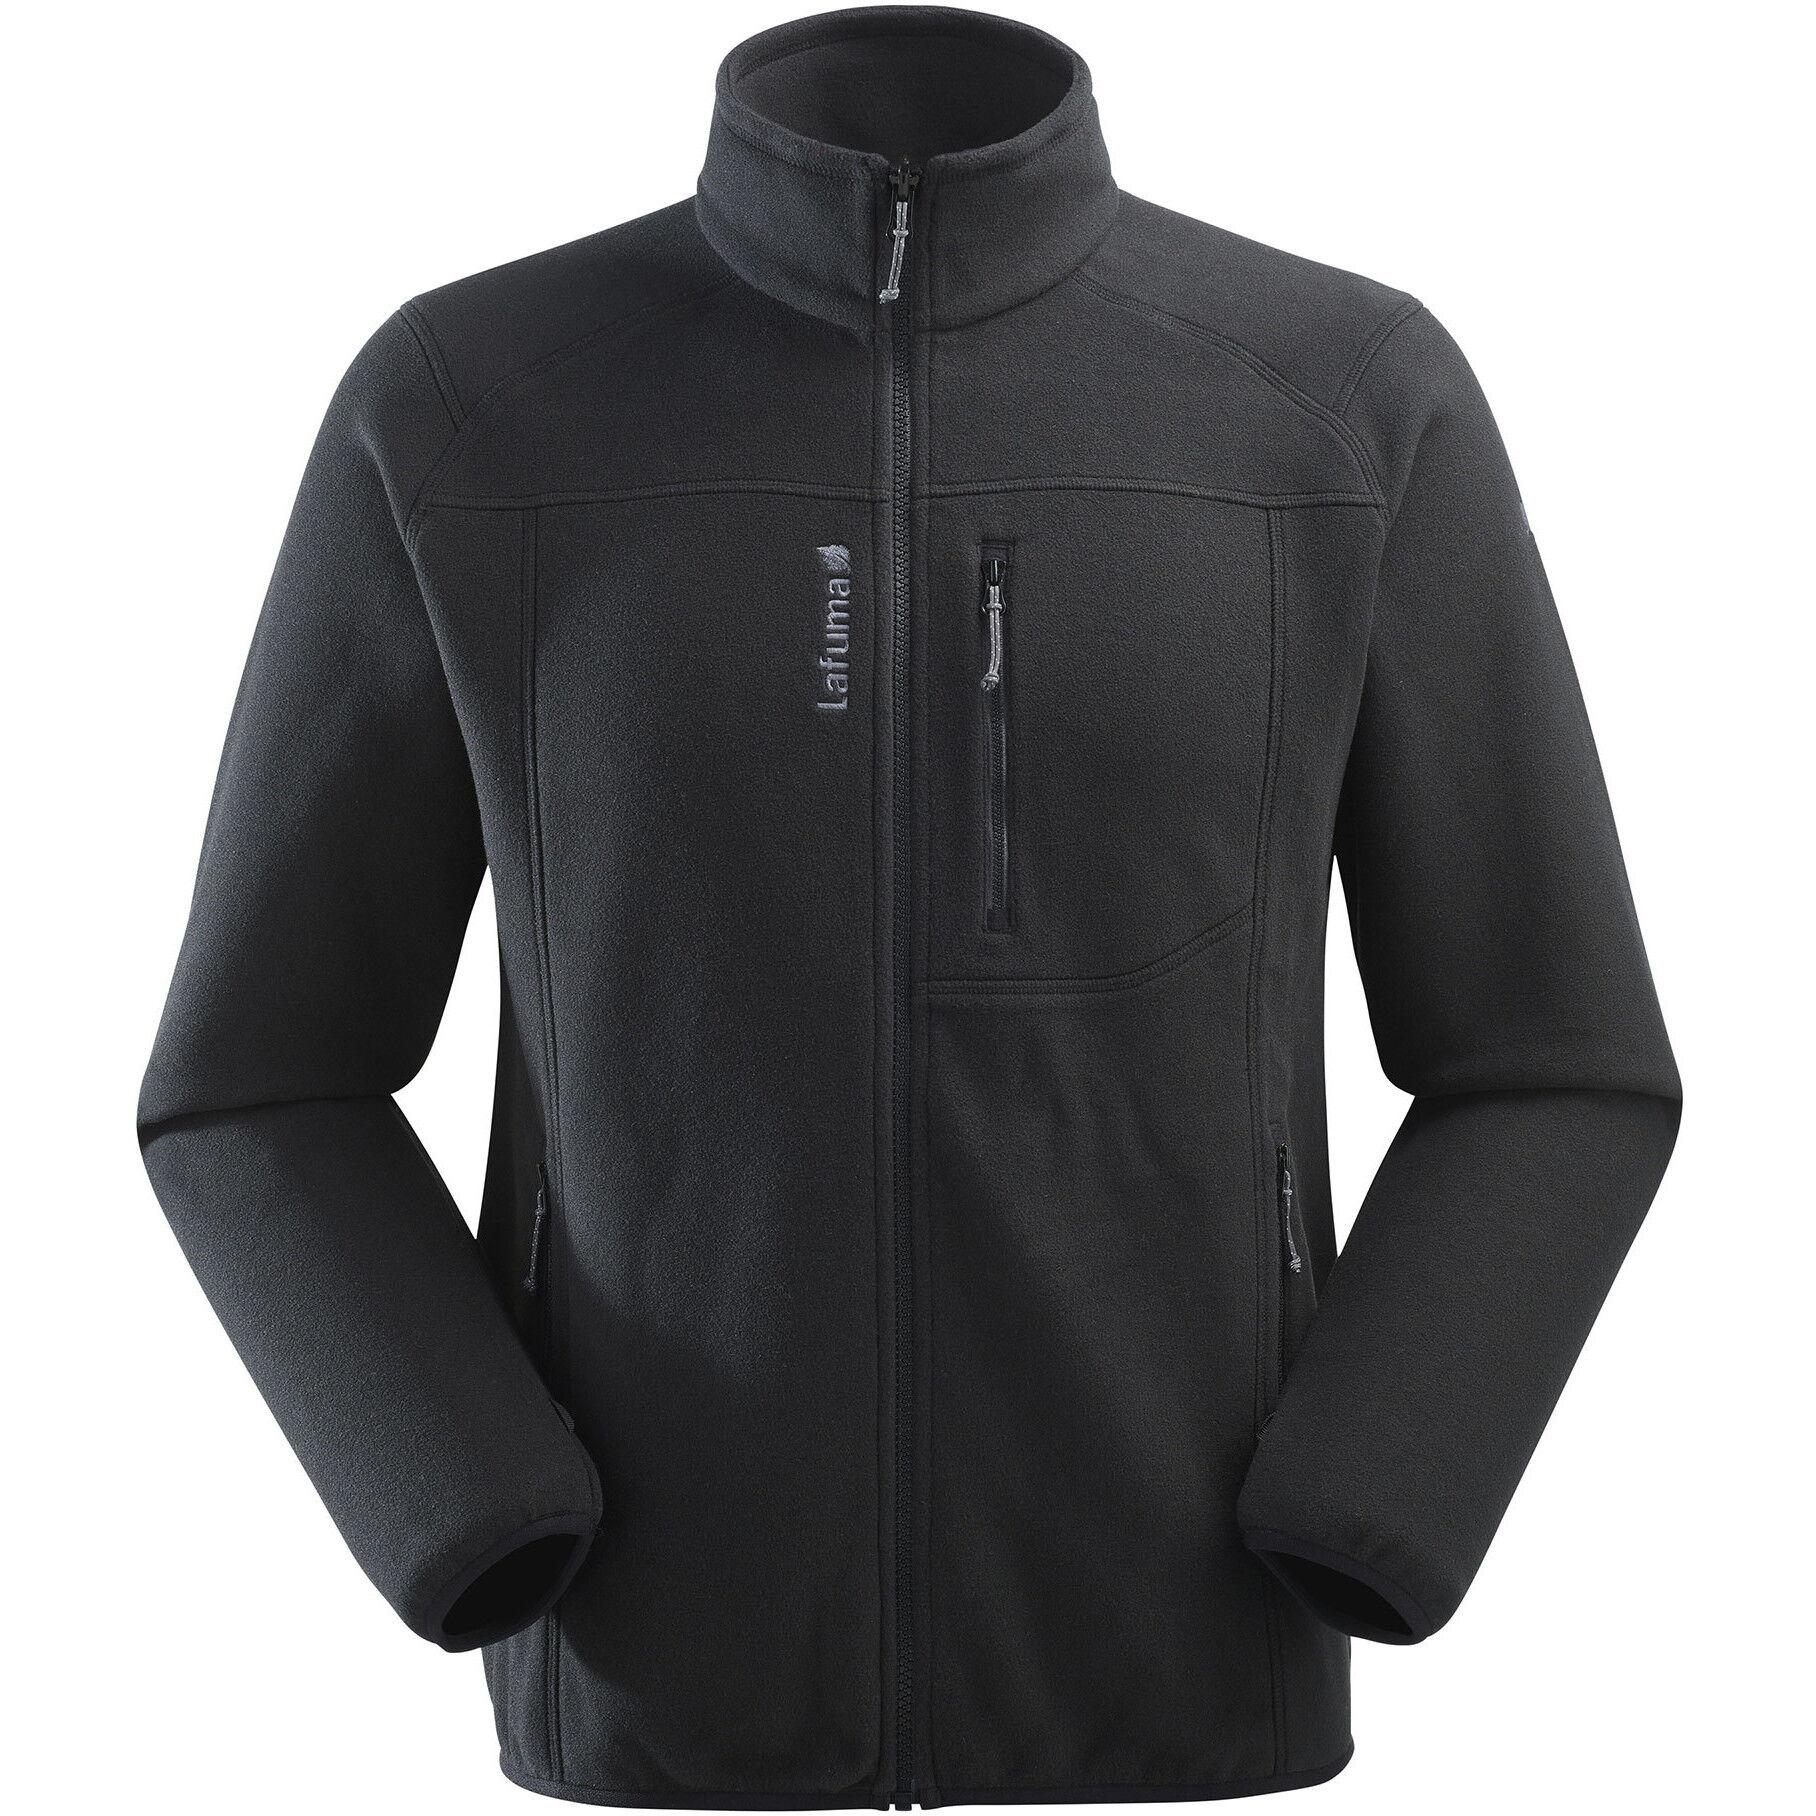 Blackcarbone Jacke Grey In Access Herren Lafuma Zip 0Ok8wnP